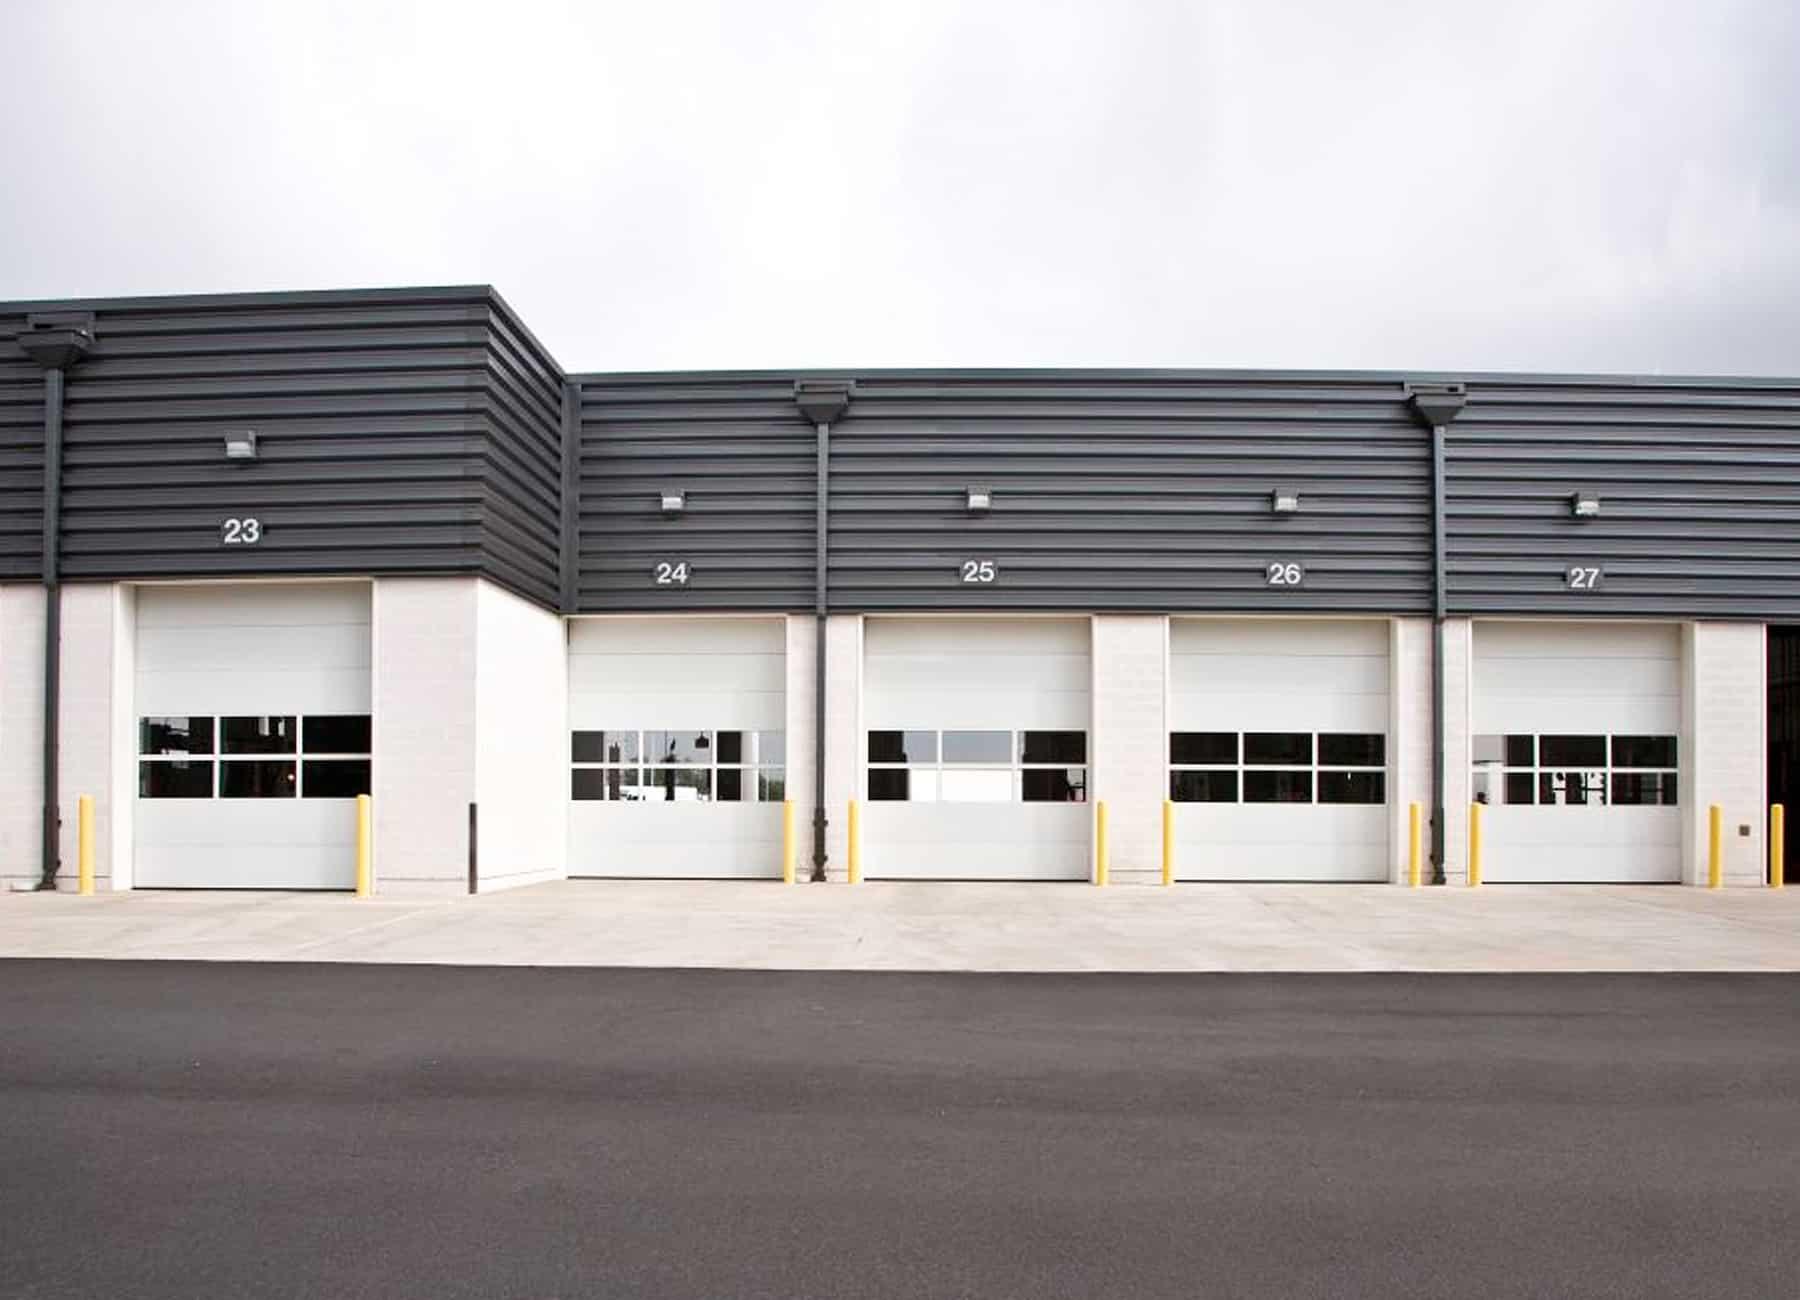 Commercial Garage Doors, Commercial Garage Doors, Overhead Door Company of Battle Creek & Jackson